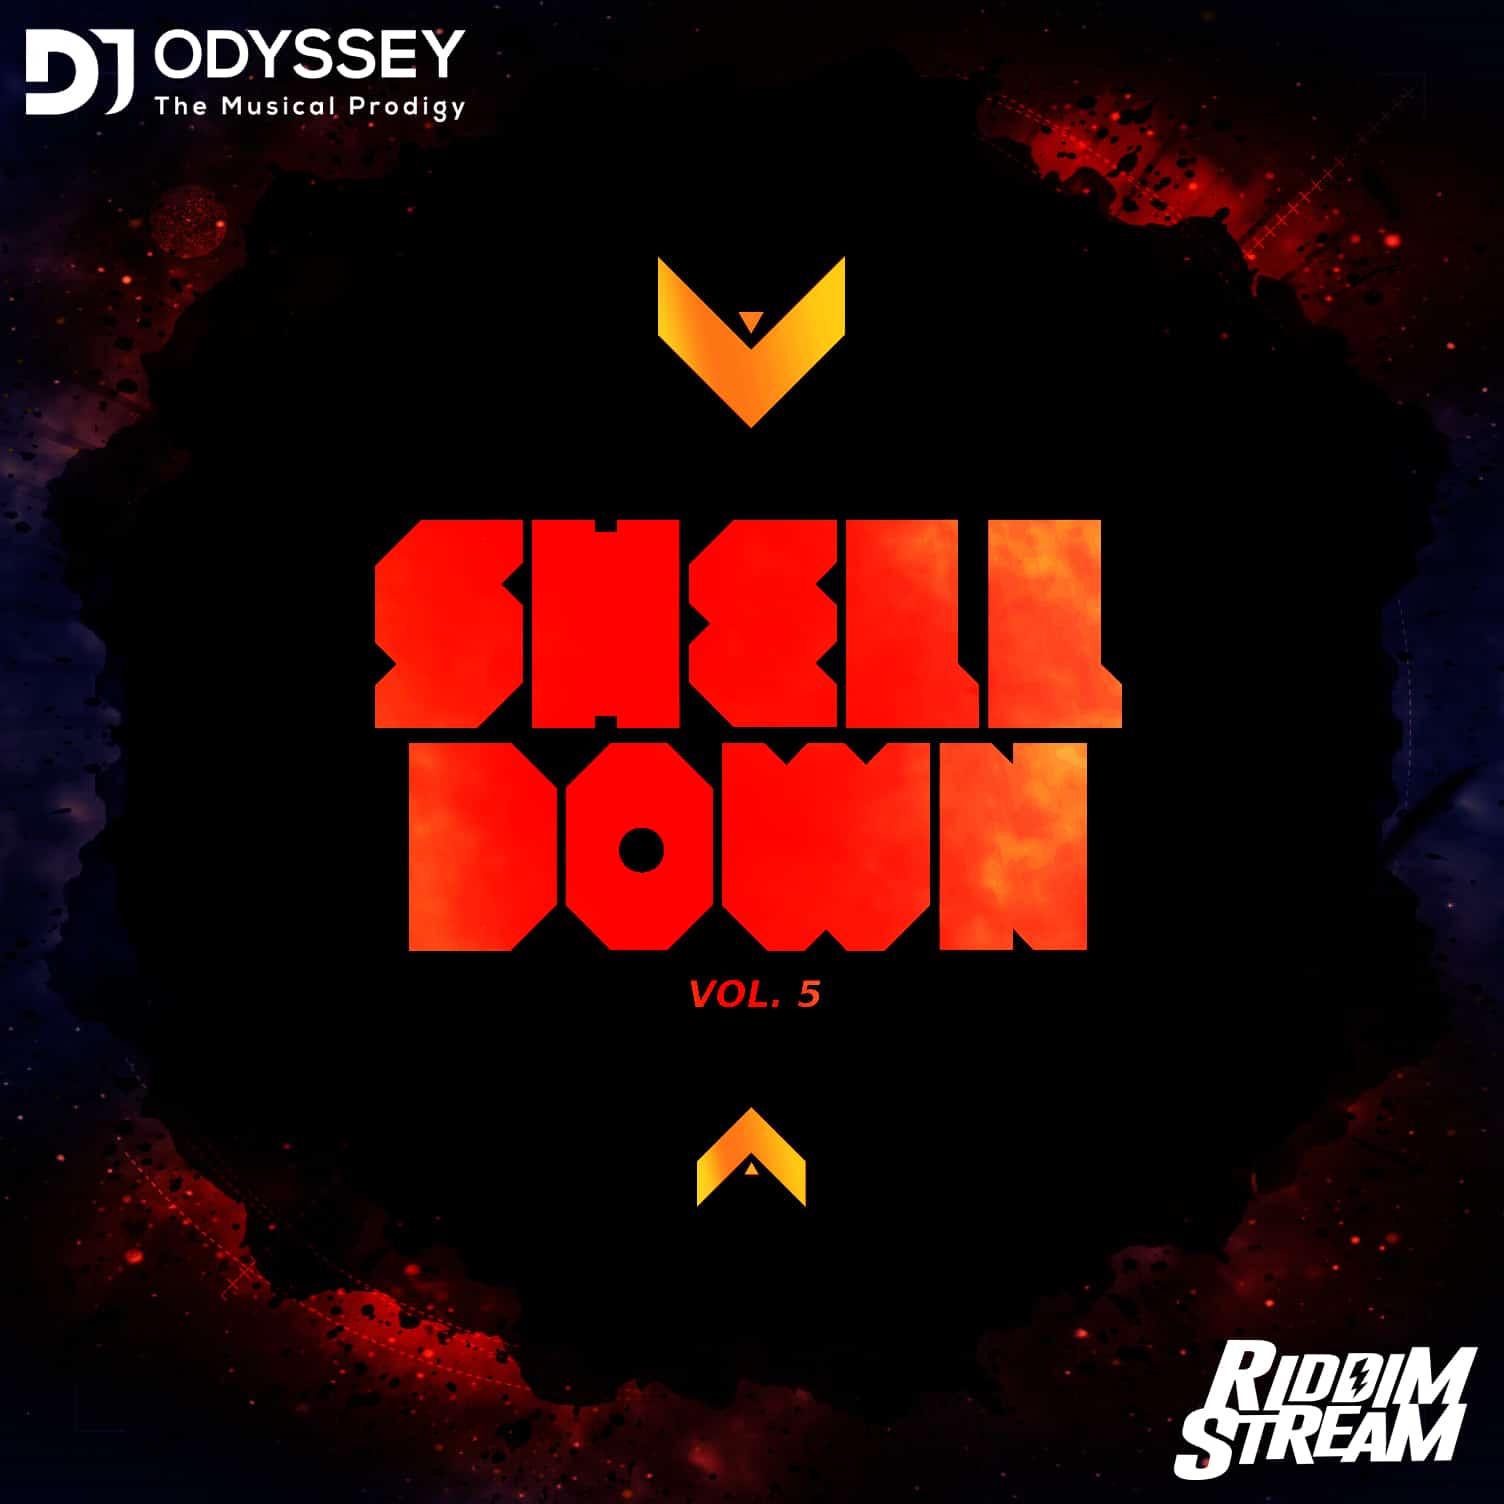 DJ Odyssey - Shell Down Vol. 5